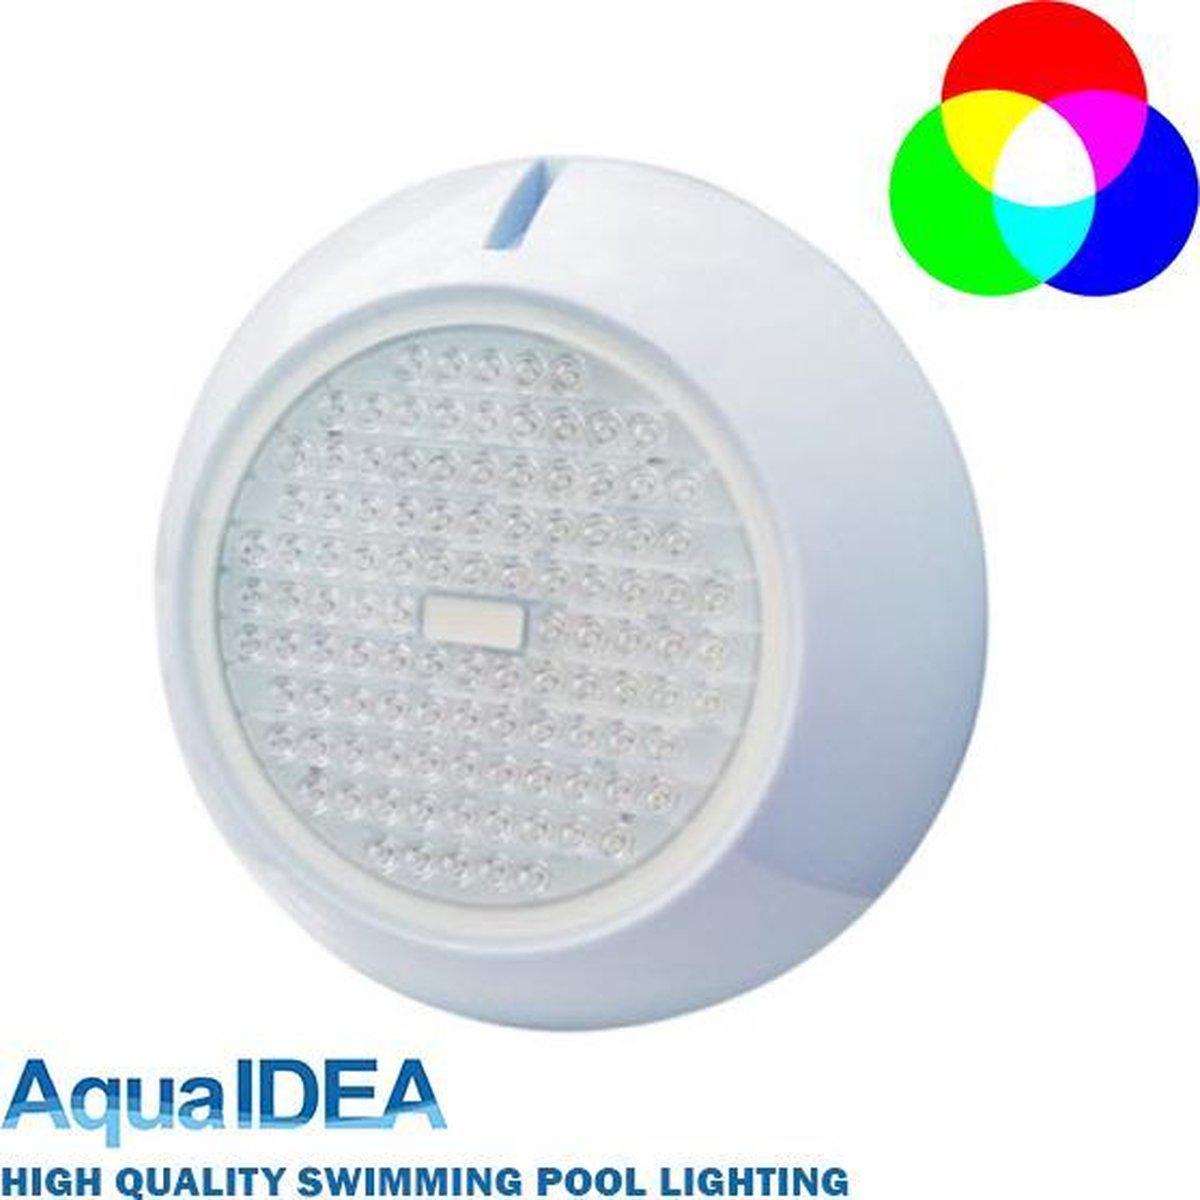 AquaIDEA - Swimming POOL LED Light - RGB MULTICOLOUR - Type P120 15 Watt 108 SMD LEDs - AC/DC12V- IP68